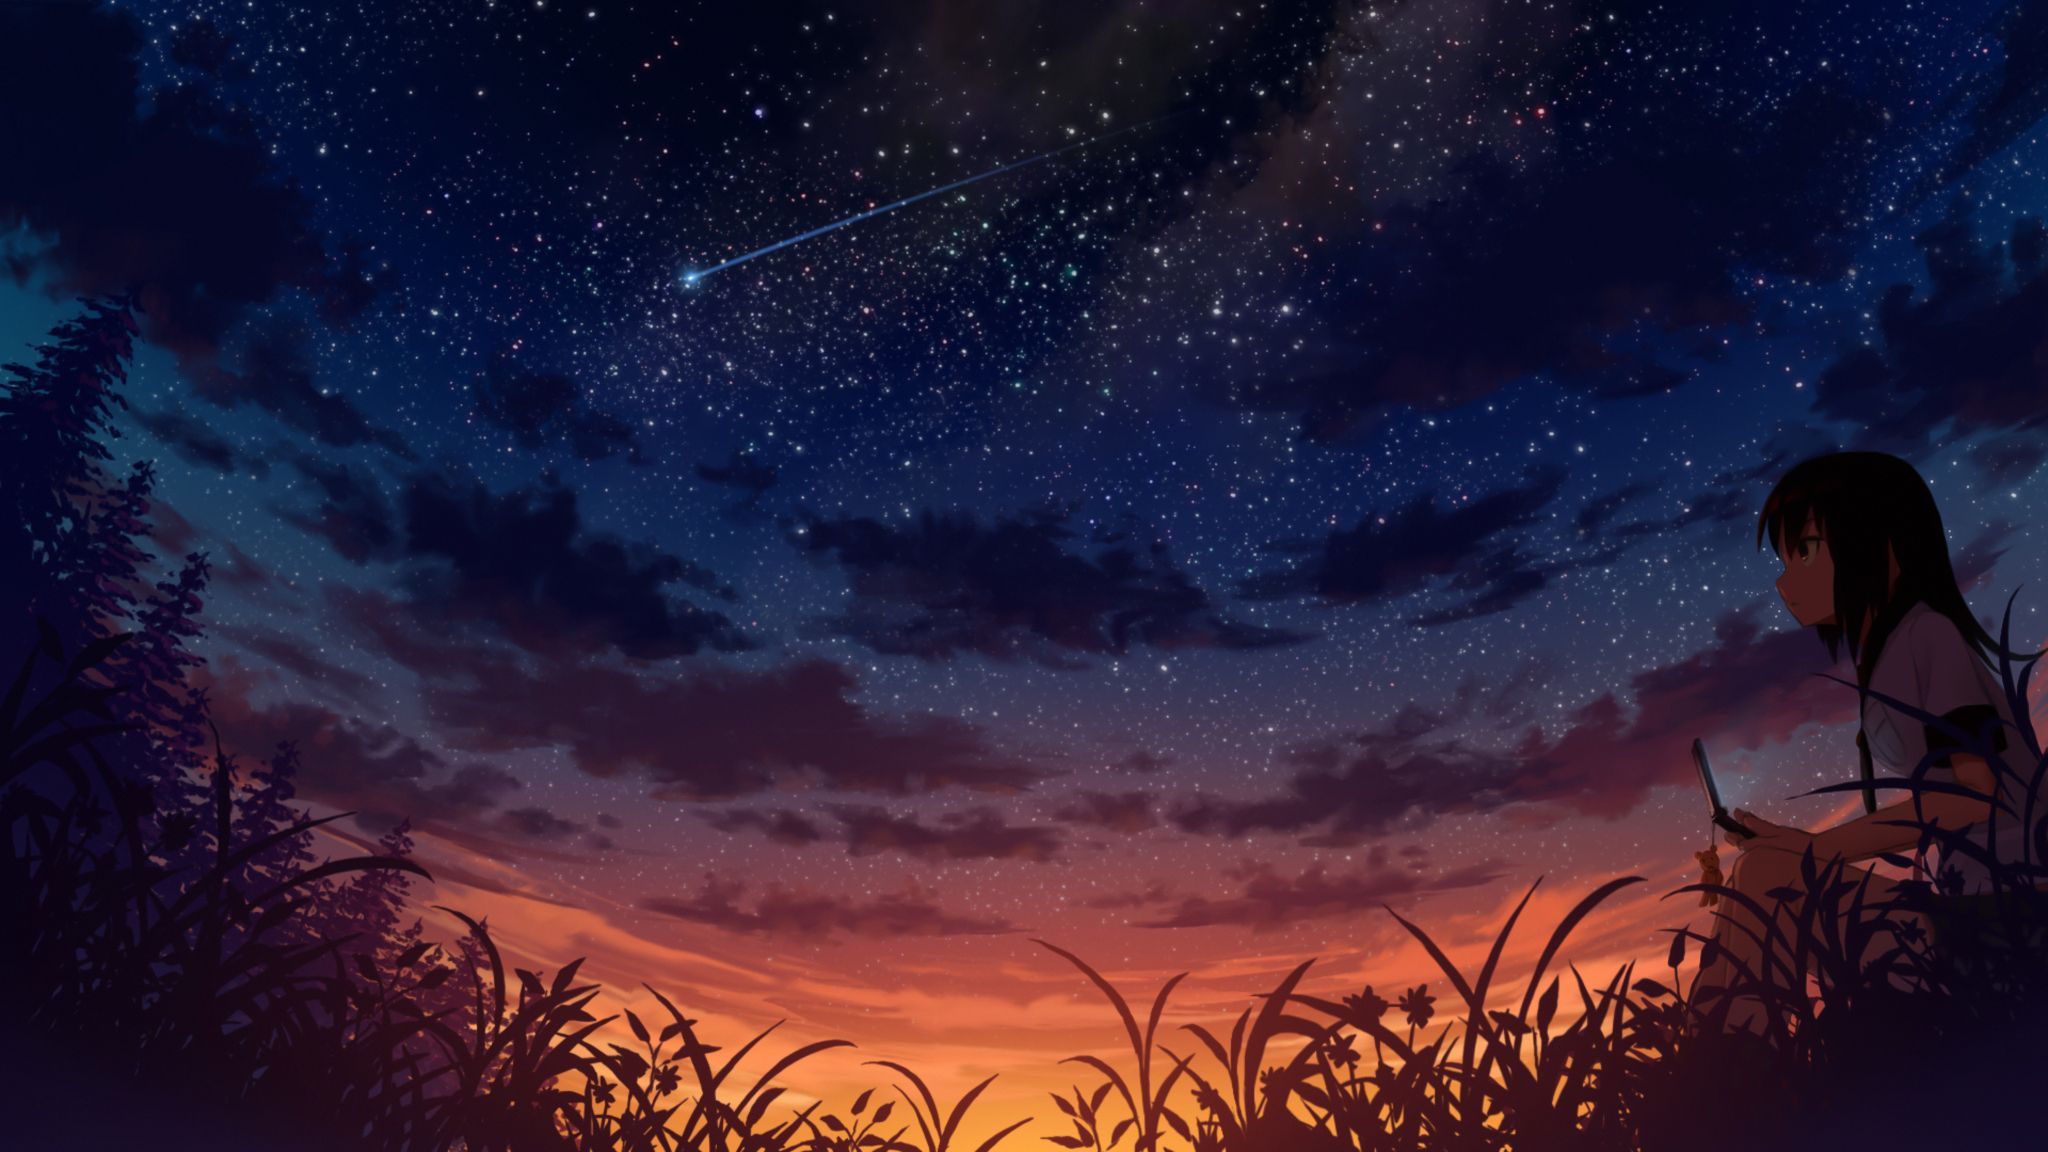 The Girl Who Leapt Through Time Wallpaper 1920x1080 Pin By Nika Shirasaki On Other Anime Scenery Wallpaper